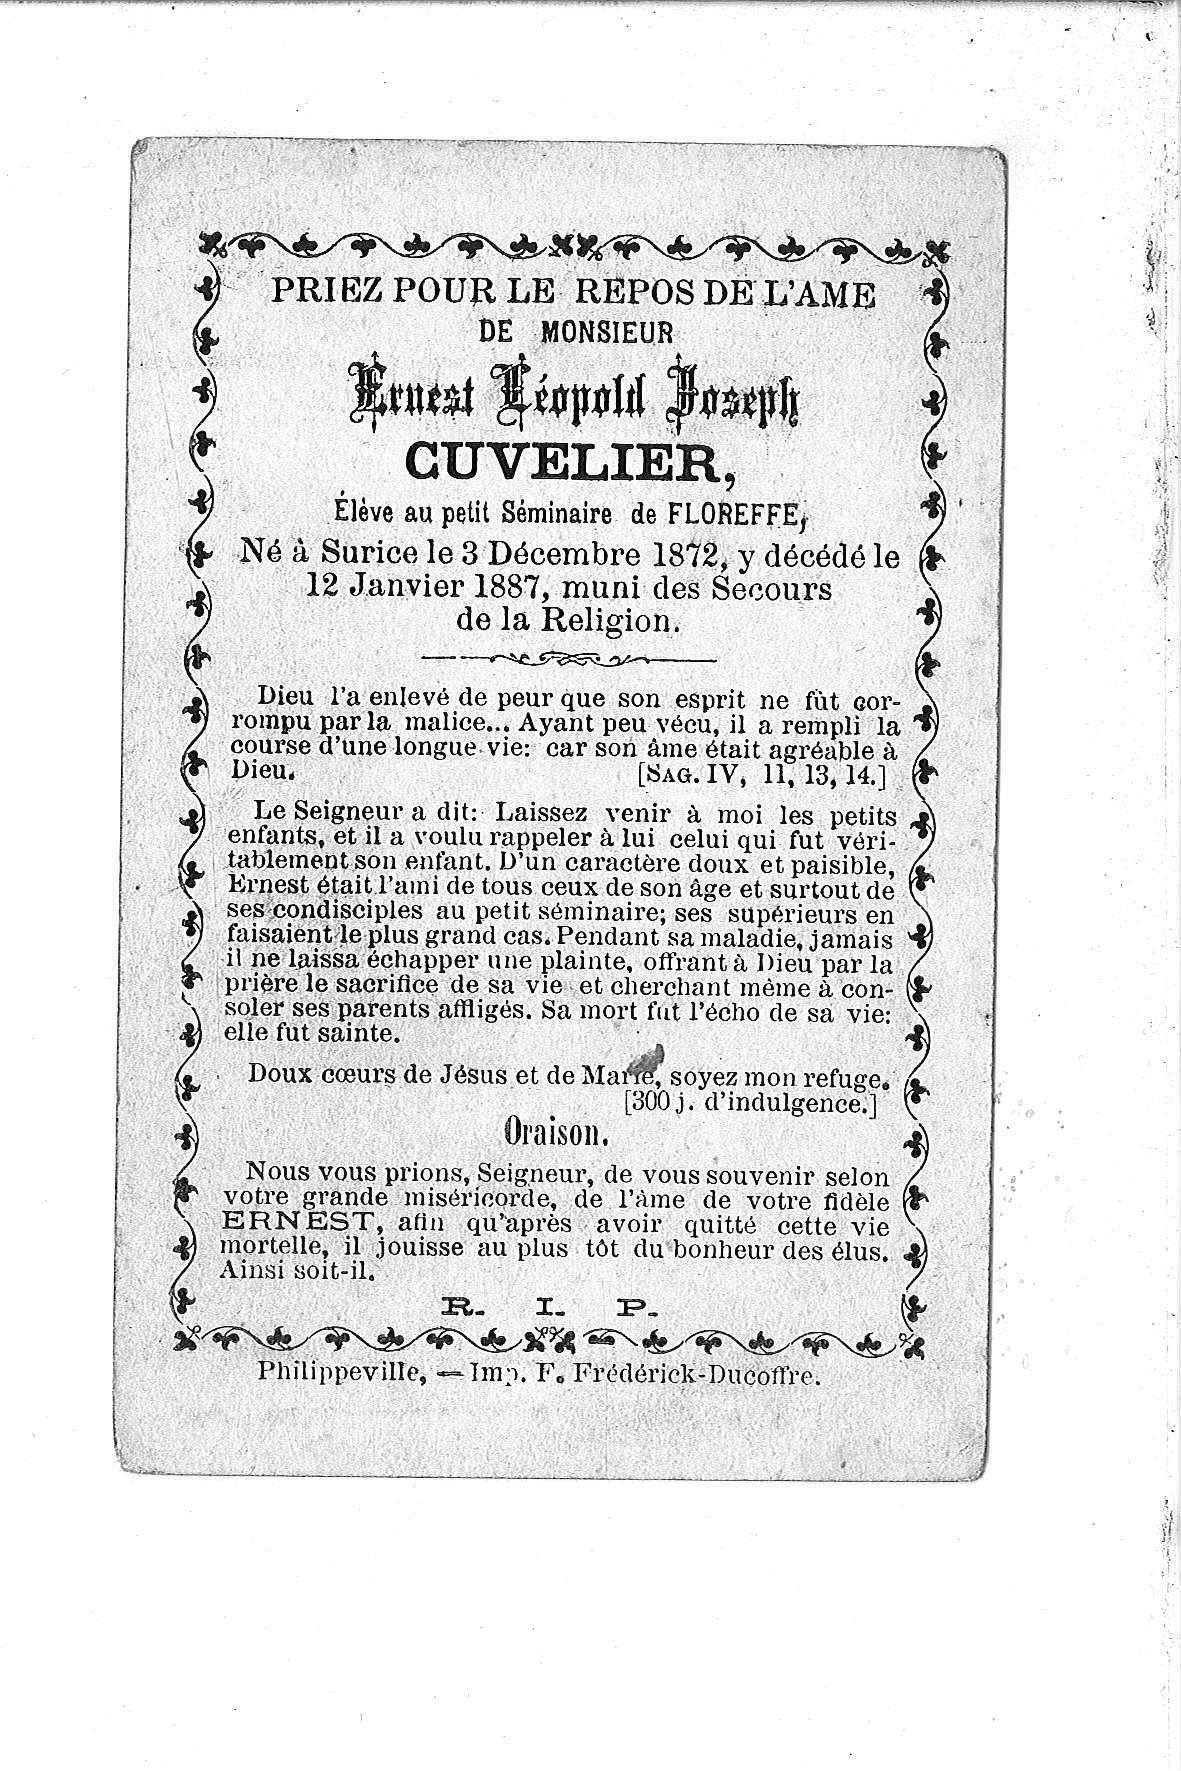 Ernest Léopold Joseph (1887) 20120117161928_00209.jpg